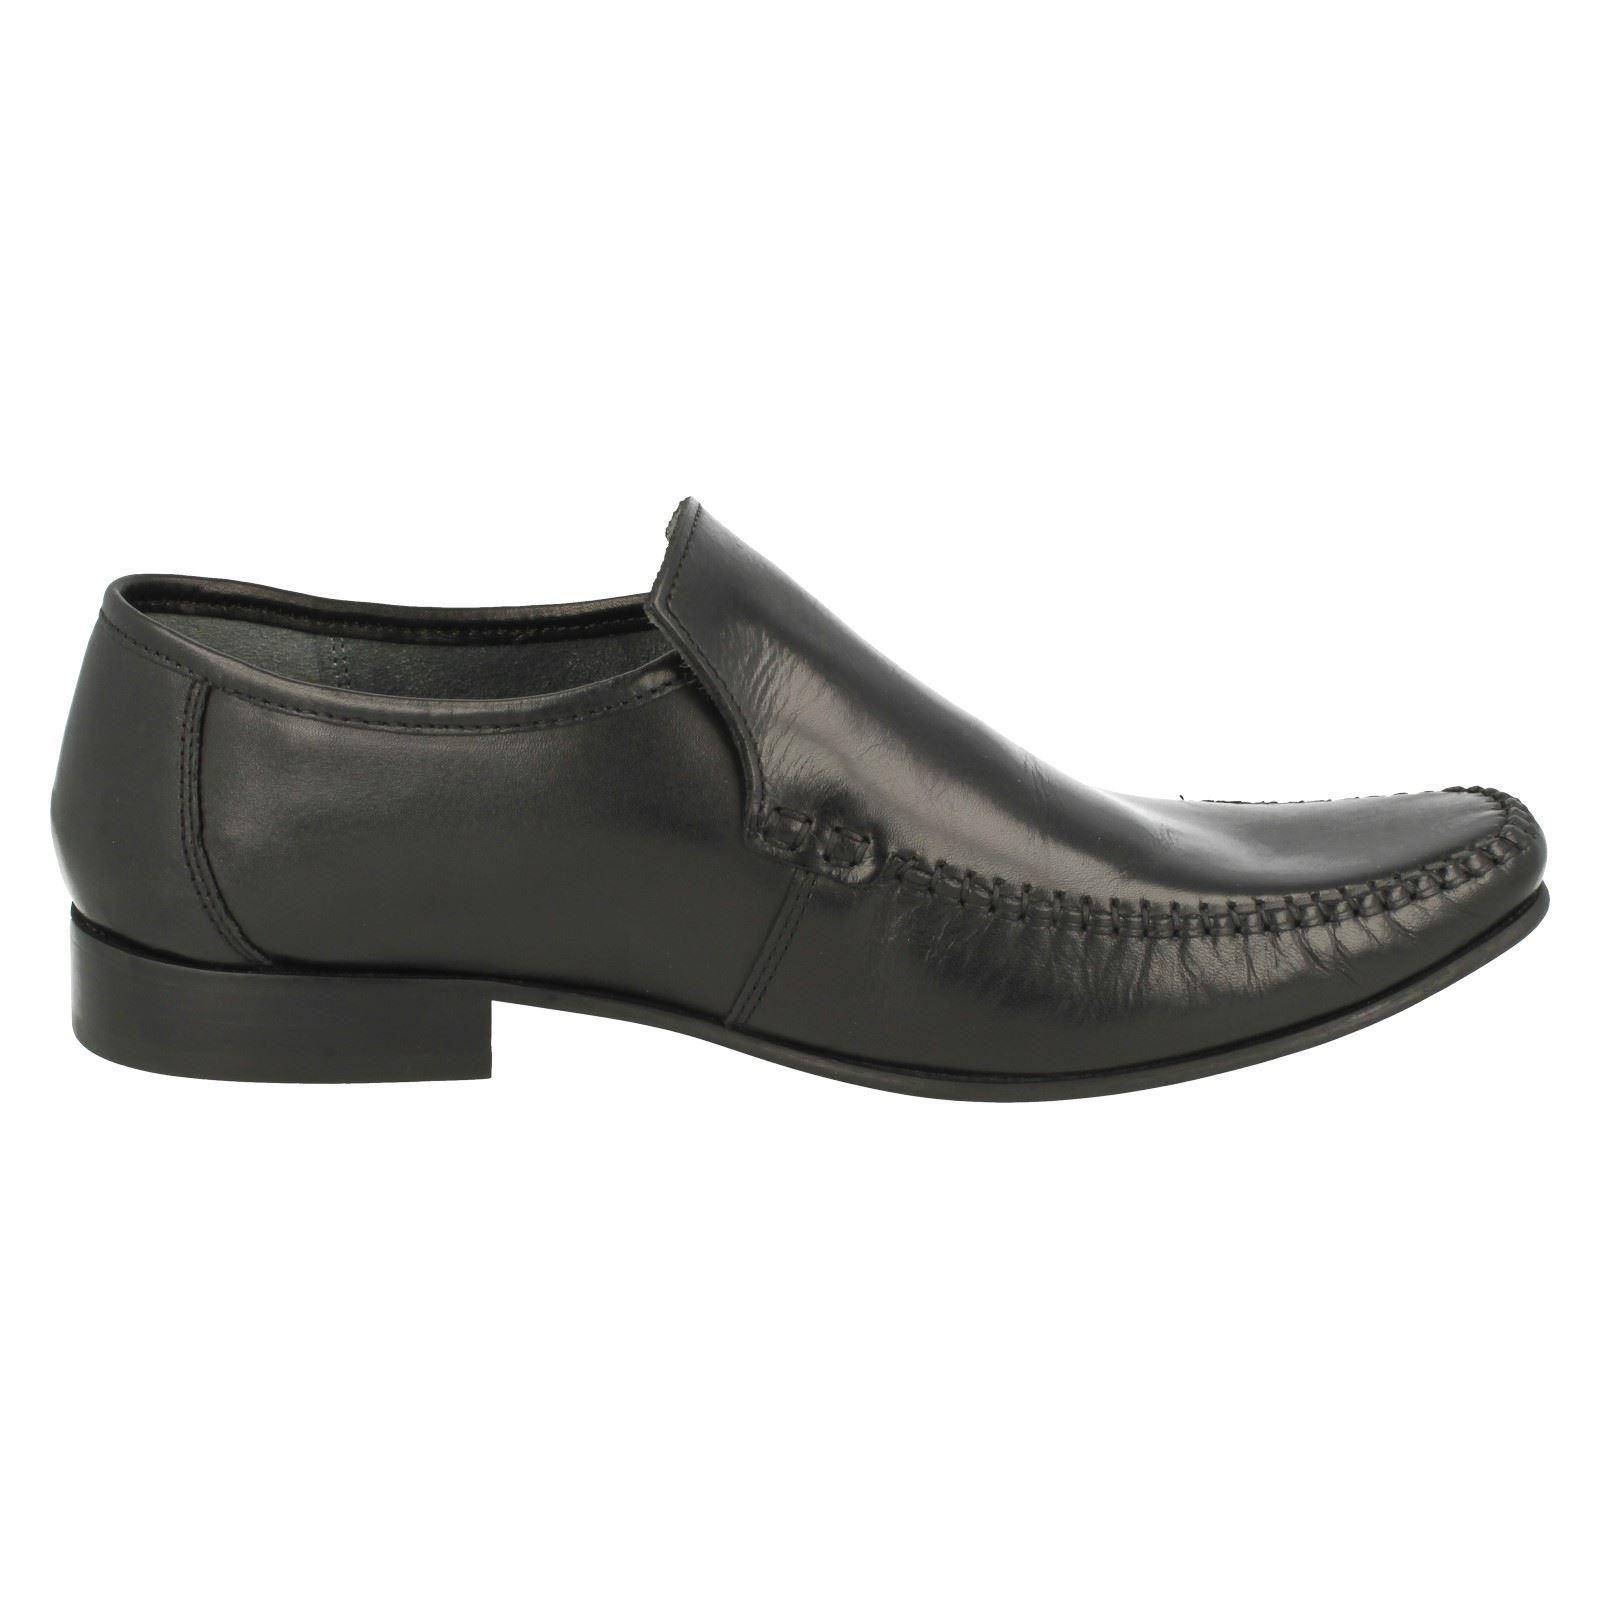 Slip Uomo Clarks Slip  On Schuhes 'Fellow Slip' aec257